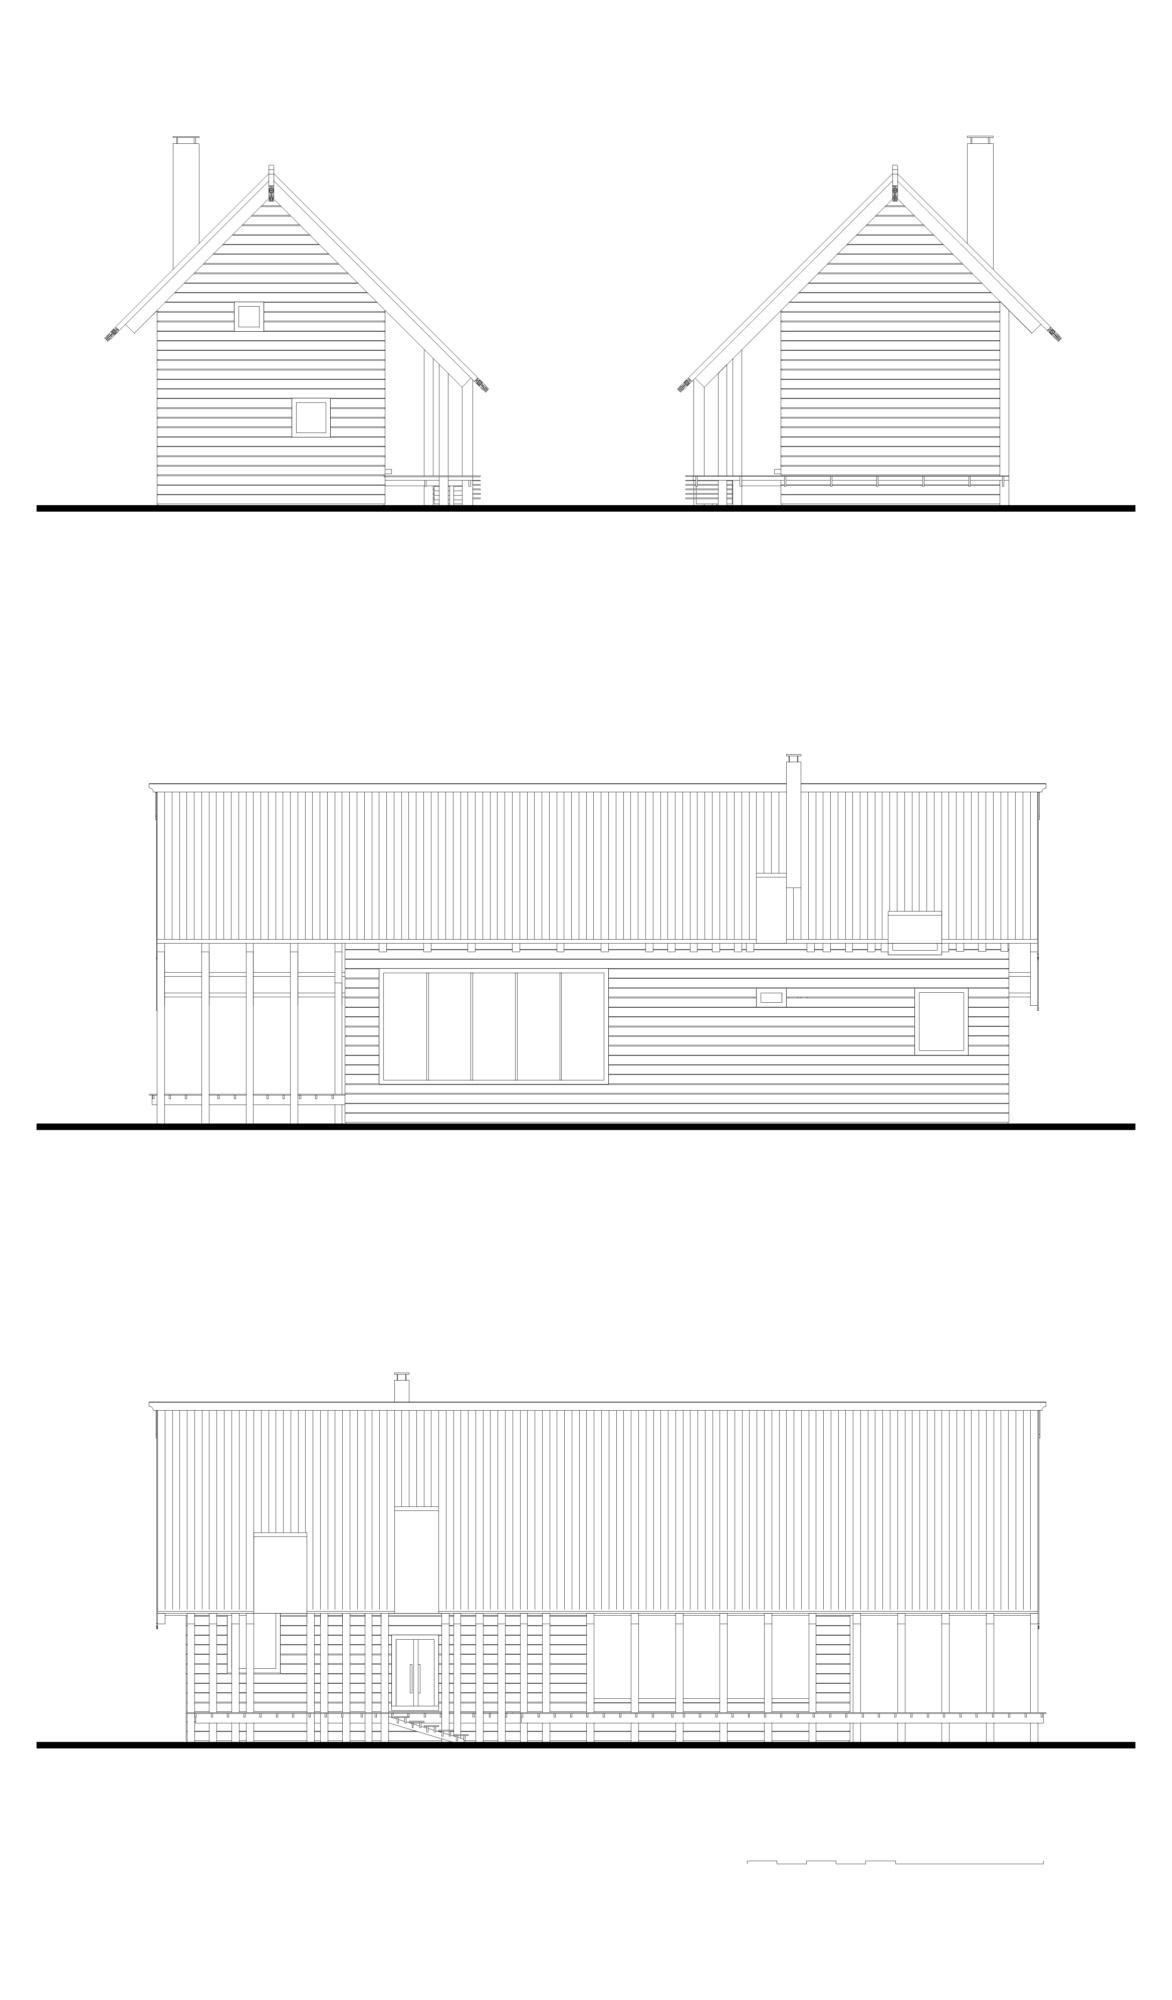 Дом на 200 м², концепция. ©DMTRVK